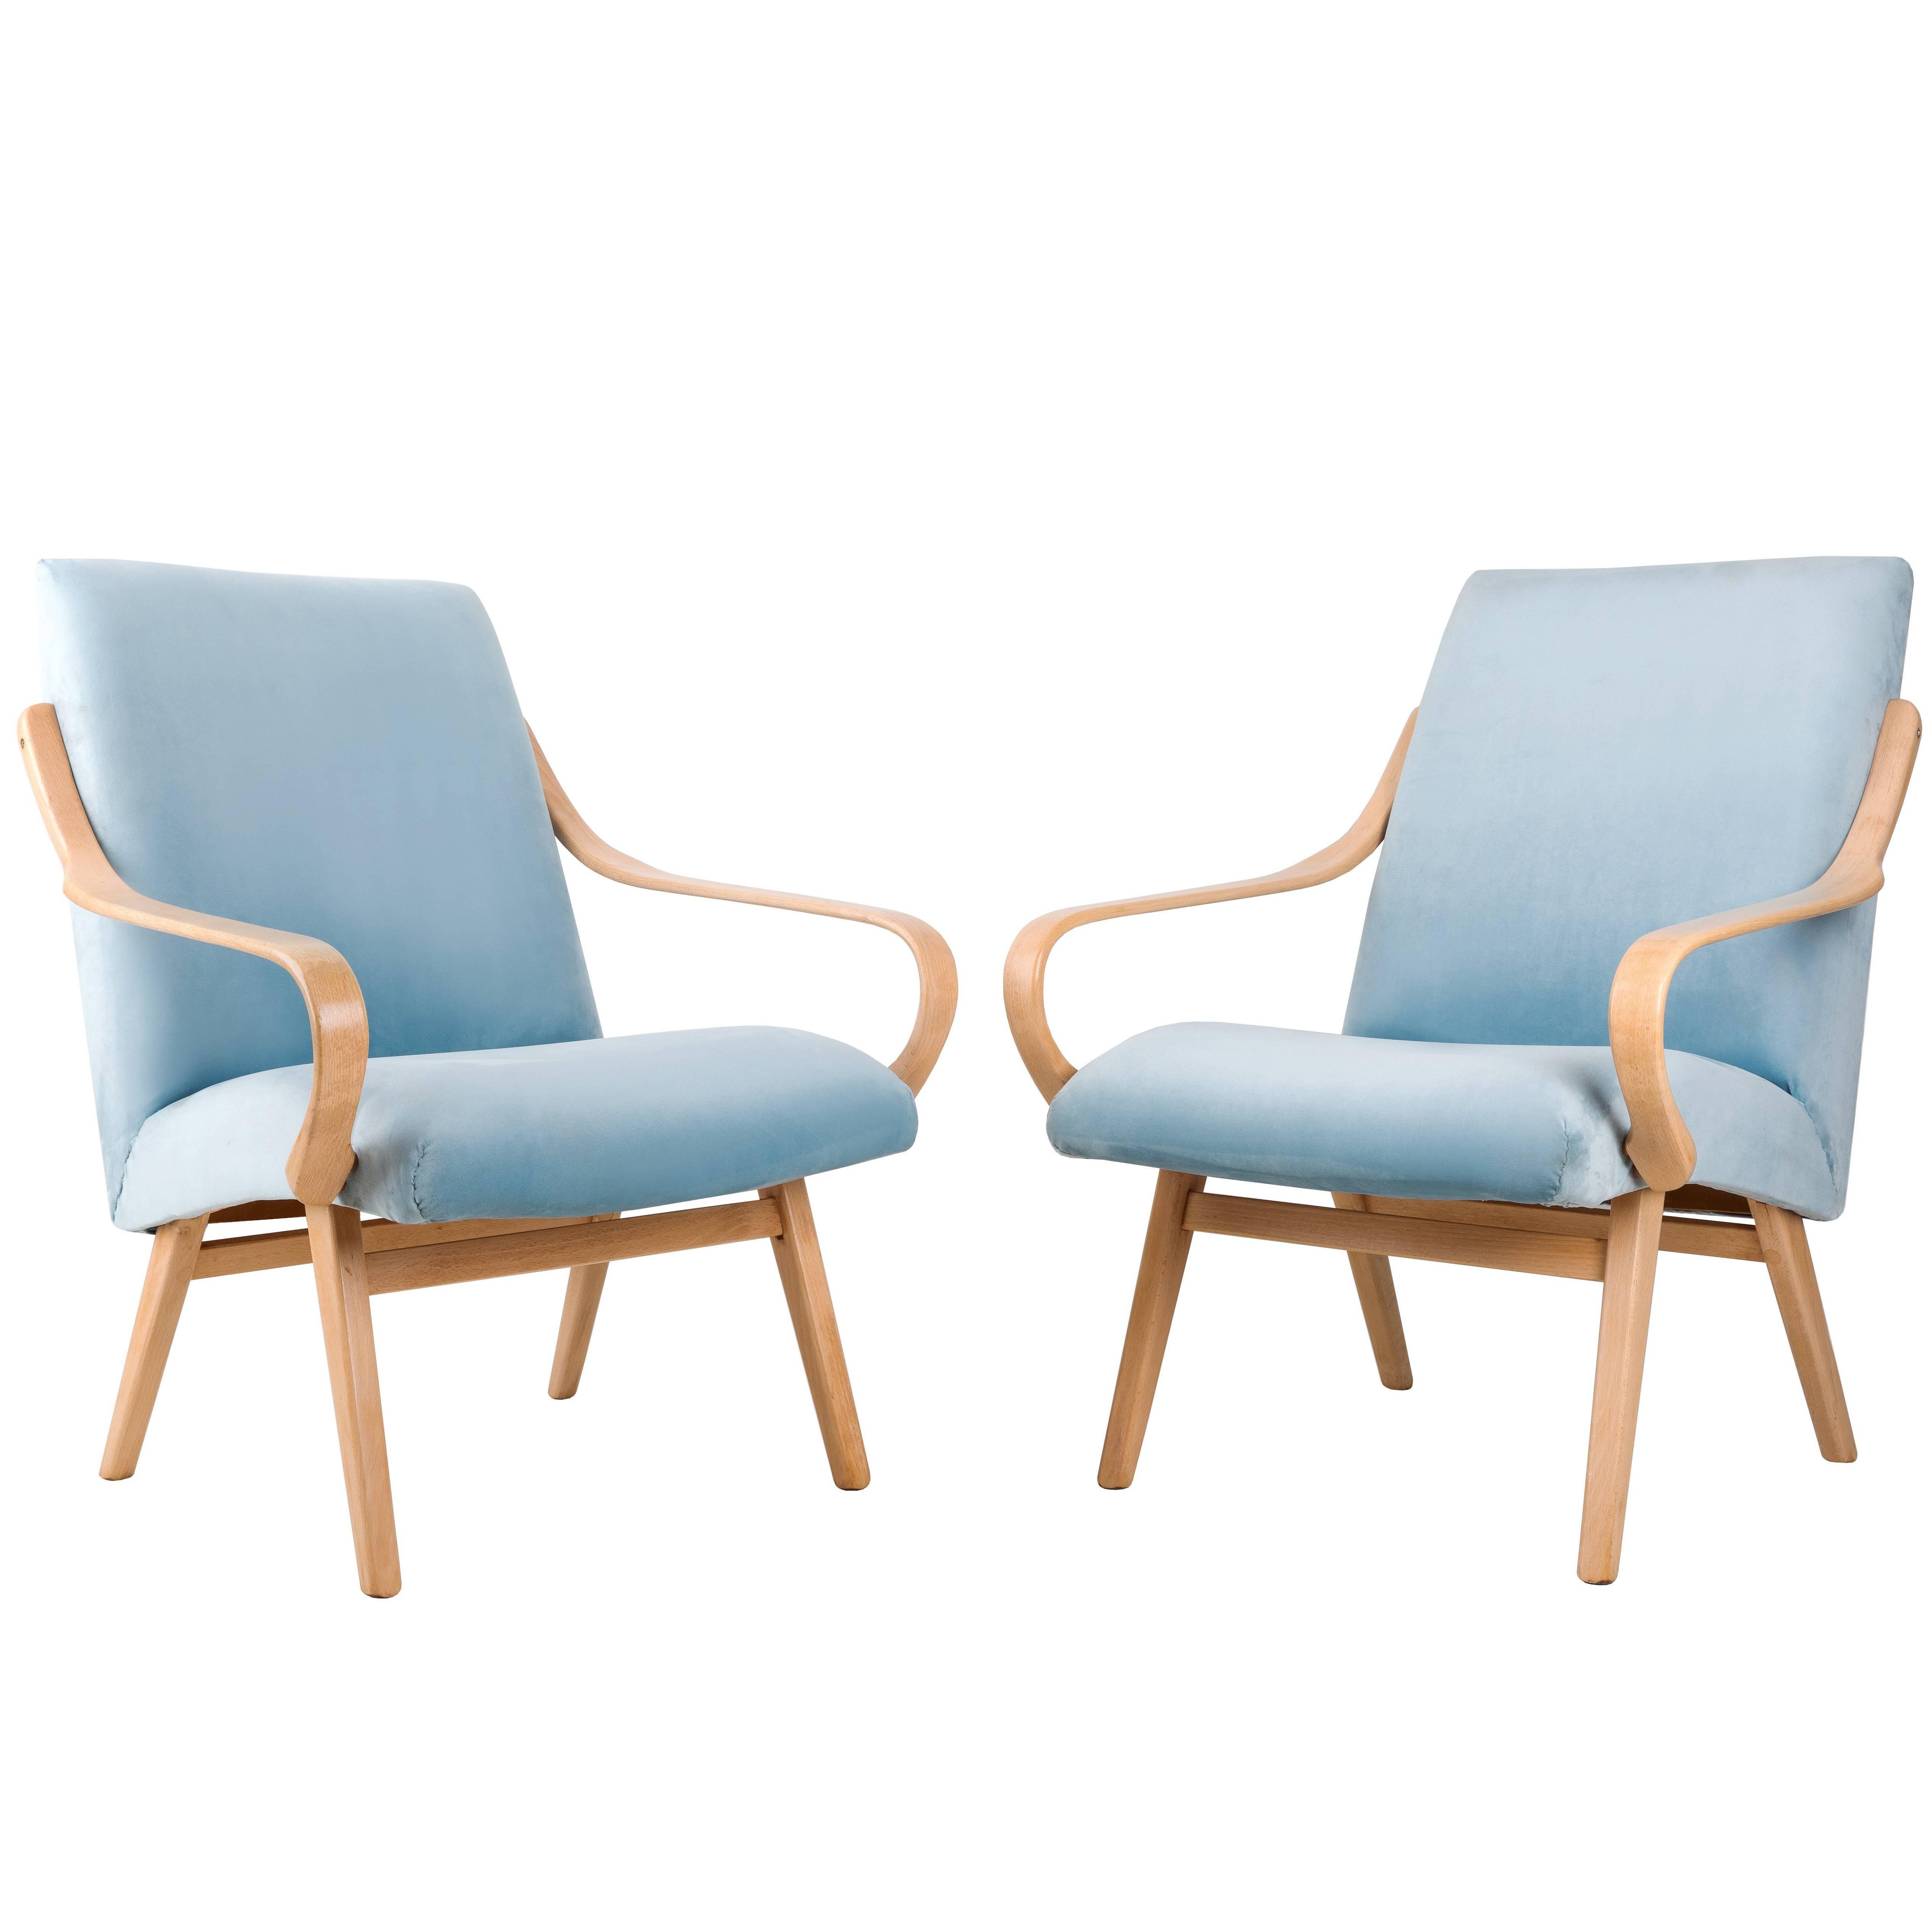 Armchairs Designed by Jaroslav Šmidek for Ton, Czech Republic, 1960s